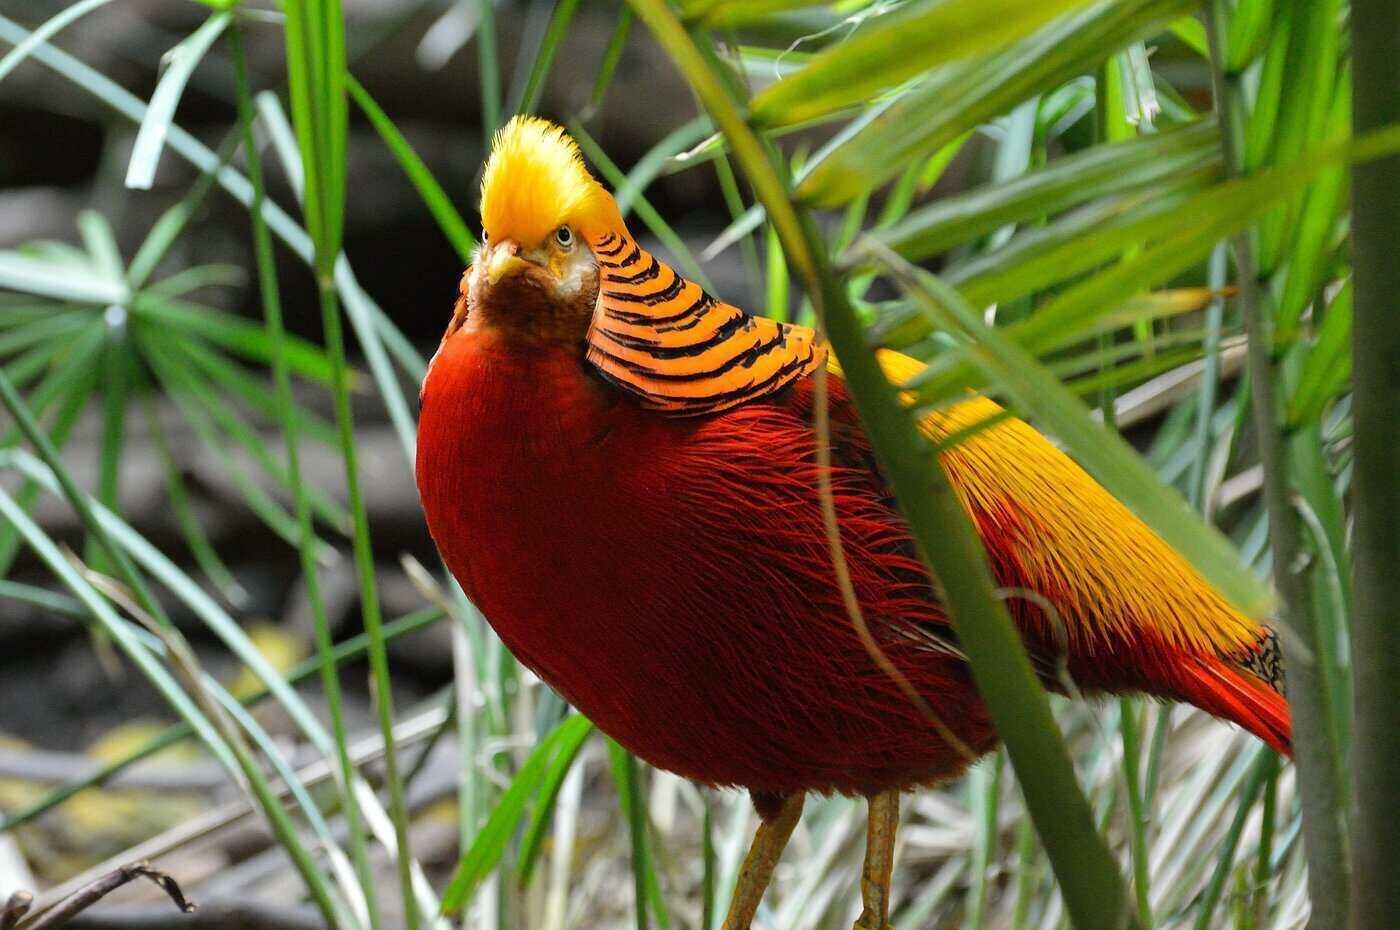 golden pheasant in grass - 20 cool golden pheasant facts